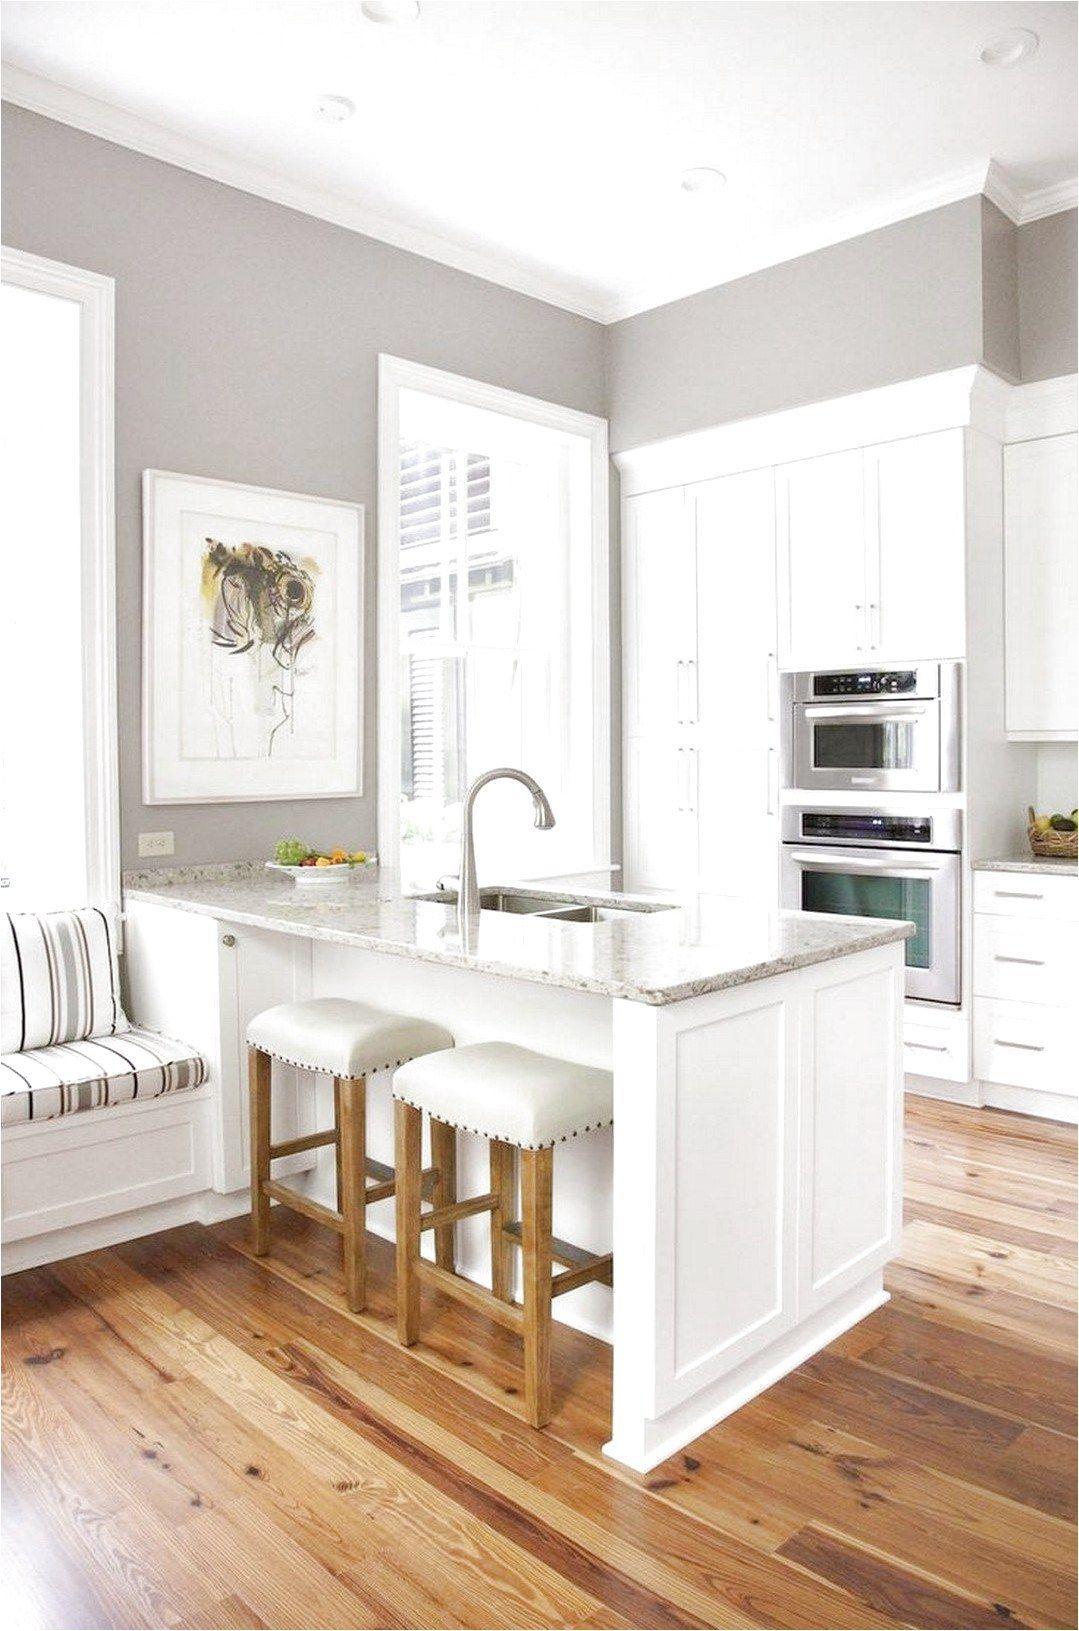 Perfect Color Wood Flooring Ideas 9 Light Medium Wood Floor White Cabinets Gray Walls Ceramicfloordesign Grey Kitchen Walls Wood Floor Kitchen Grey Walls